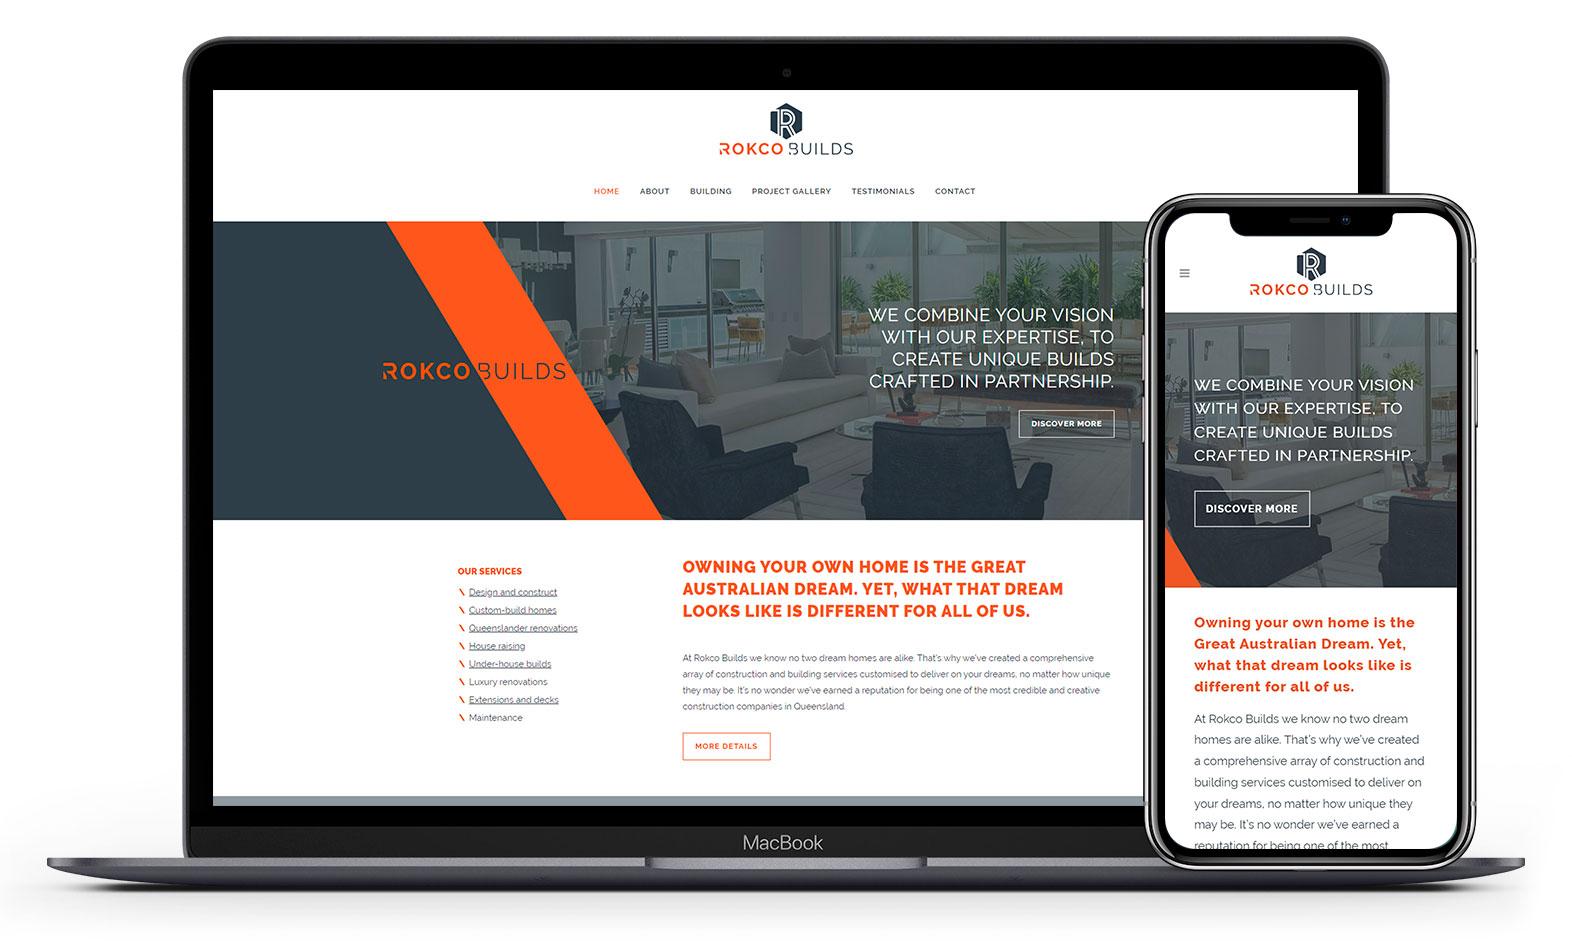 Rokco Builds' website design displayed responsive devices